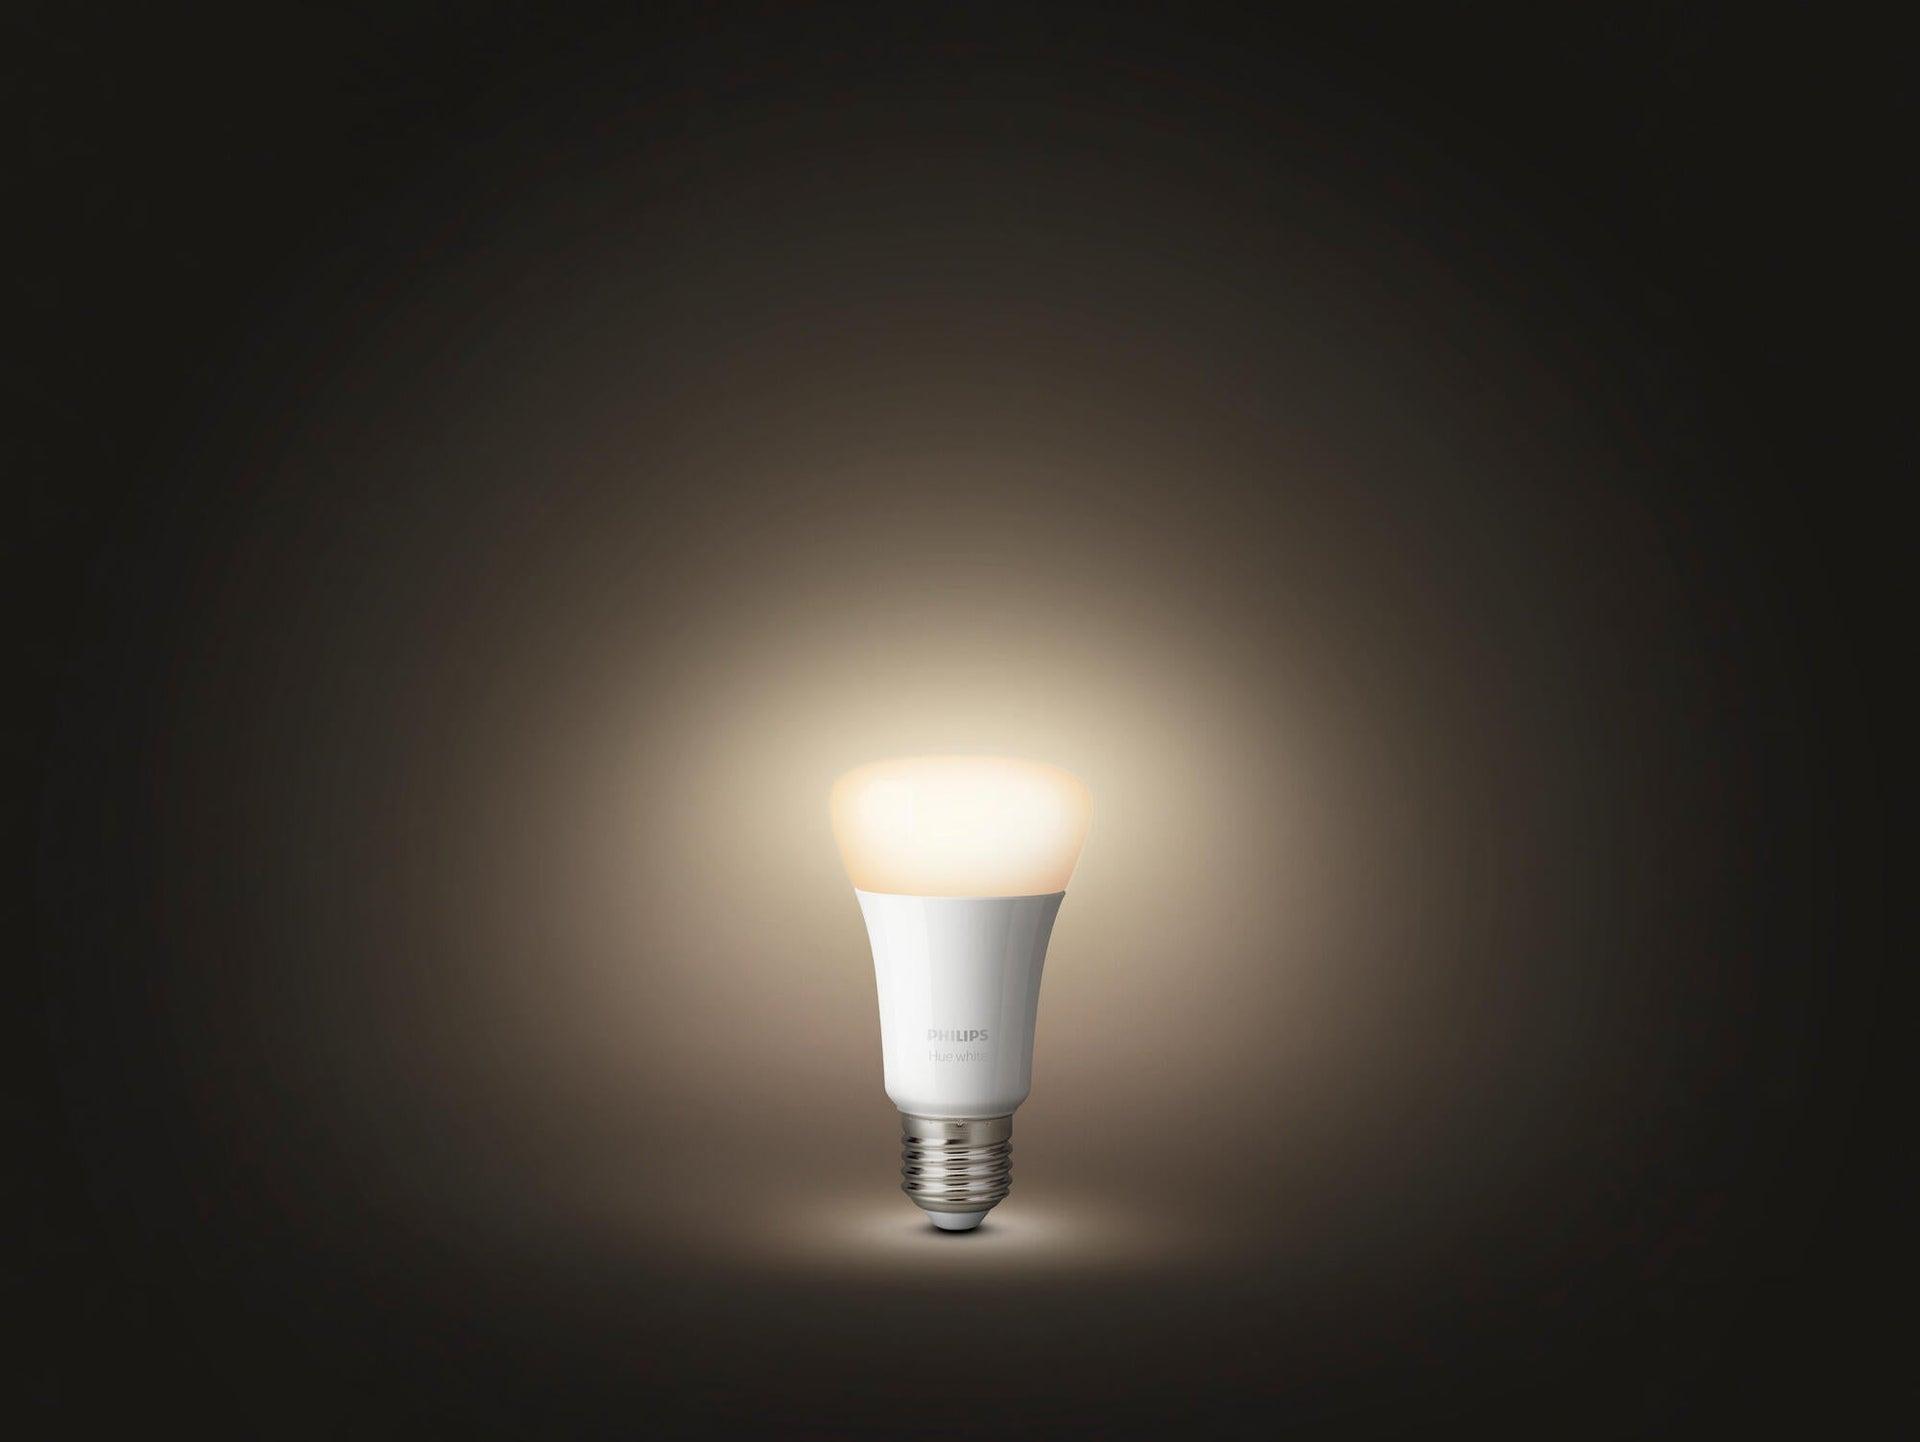 Lampadina collegato LED, HUE WHITE BLUETOOTH + TELECOMANDO, E27, Goccia, Opaco, Luce calda, 9W=806LM (equiv 60 W), 150° , PHILIPS HUE - 5